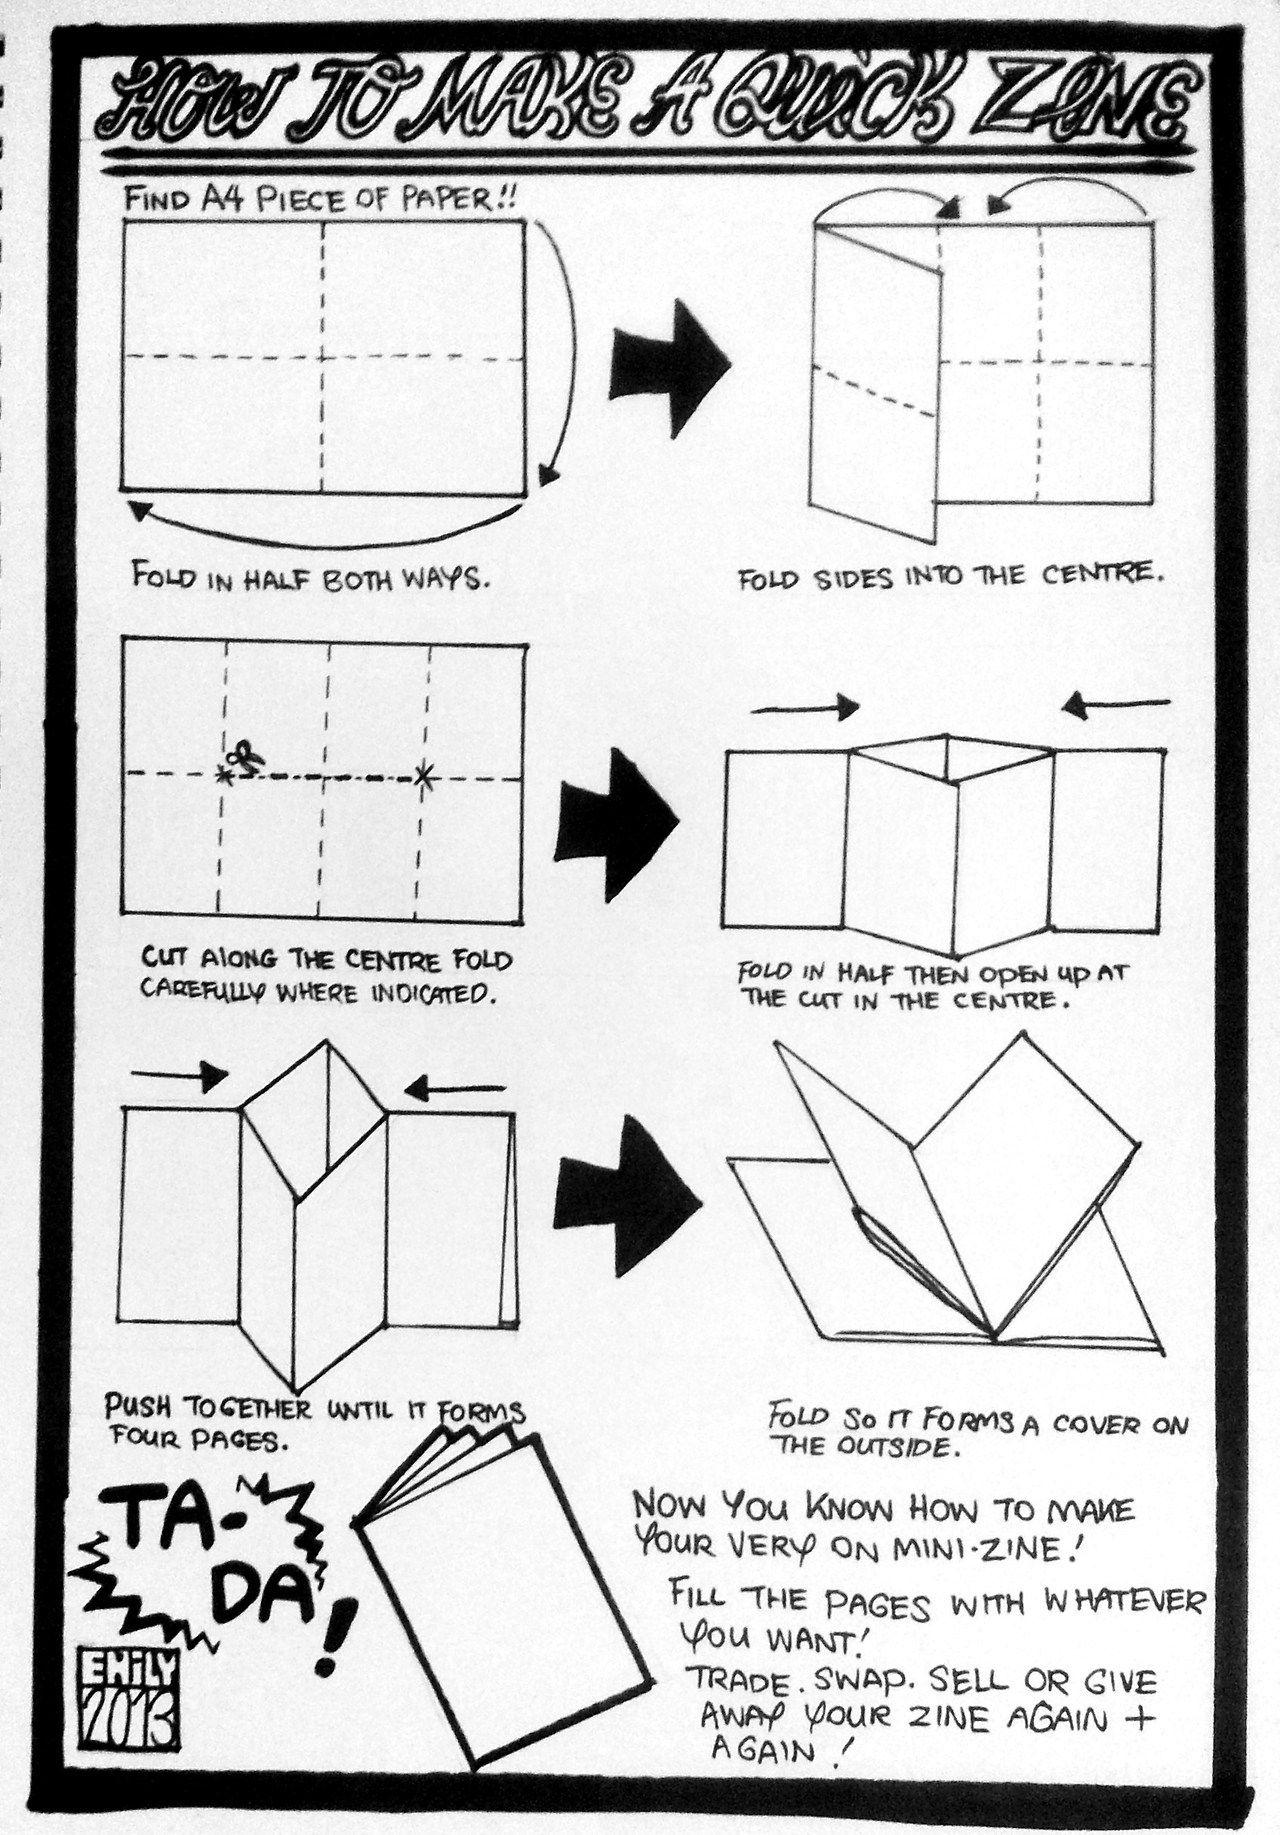 flipe  munyuck   u2018how to make a quick zine u20191  using an a4 piece of paper fold it in half both